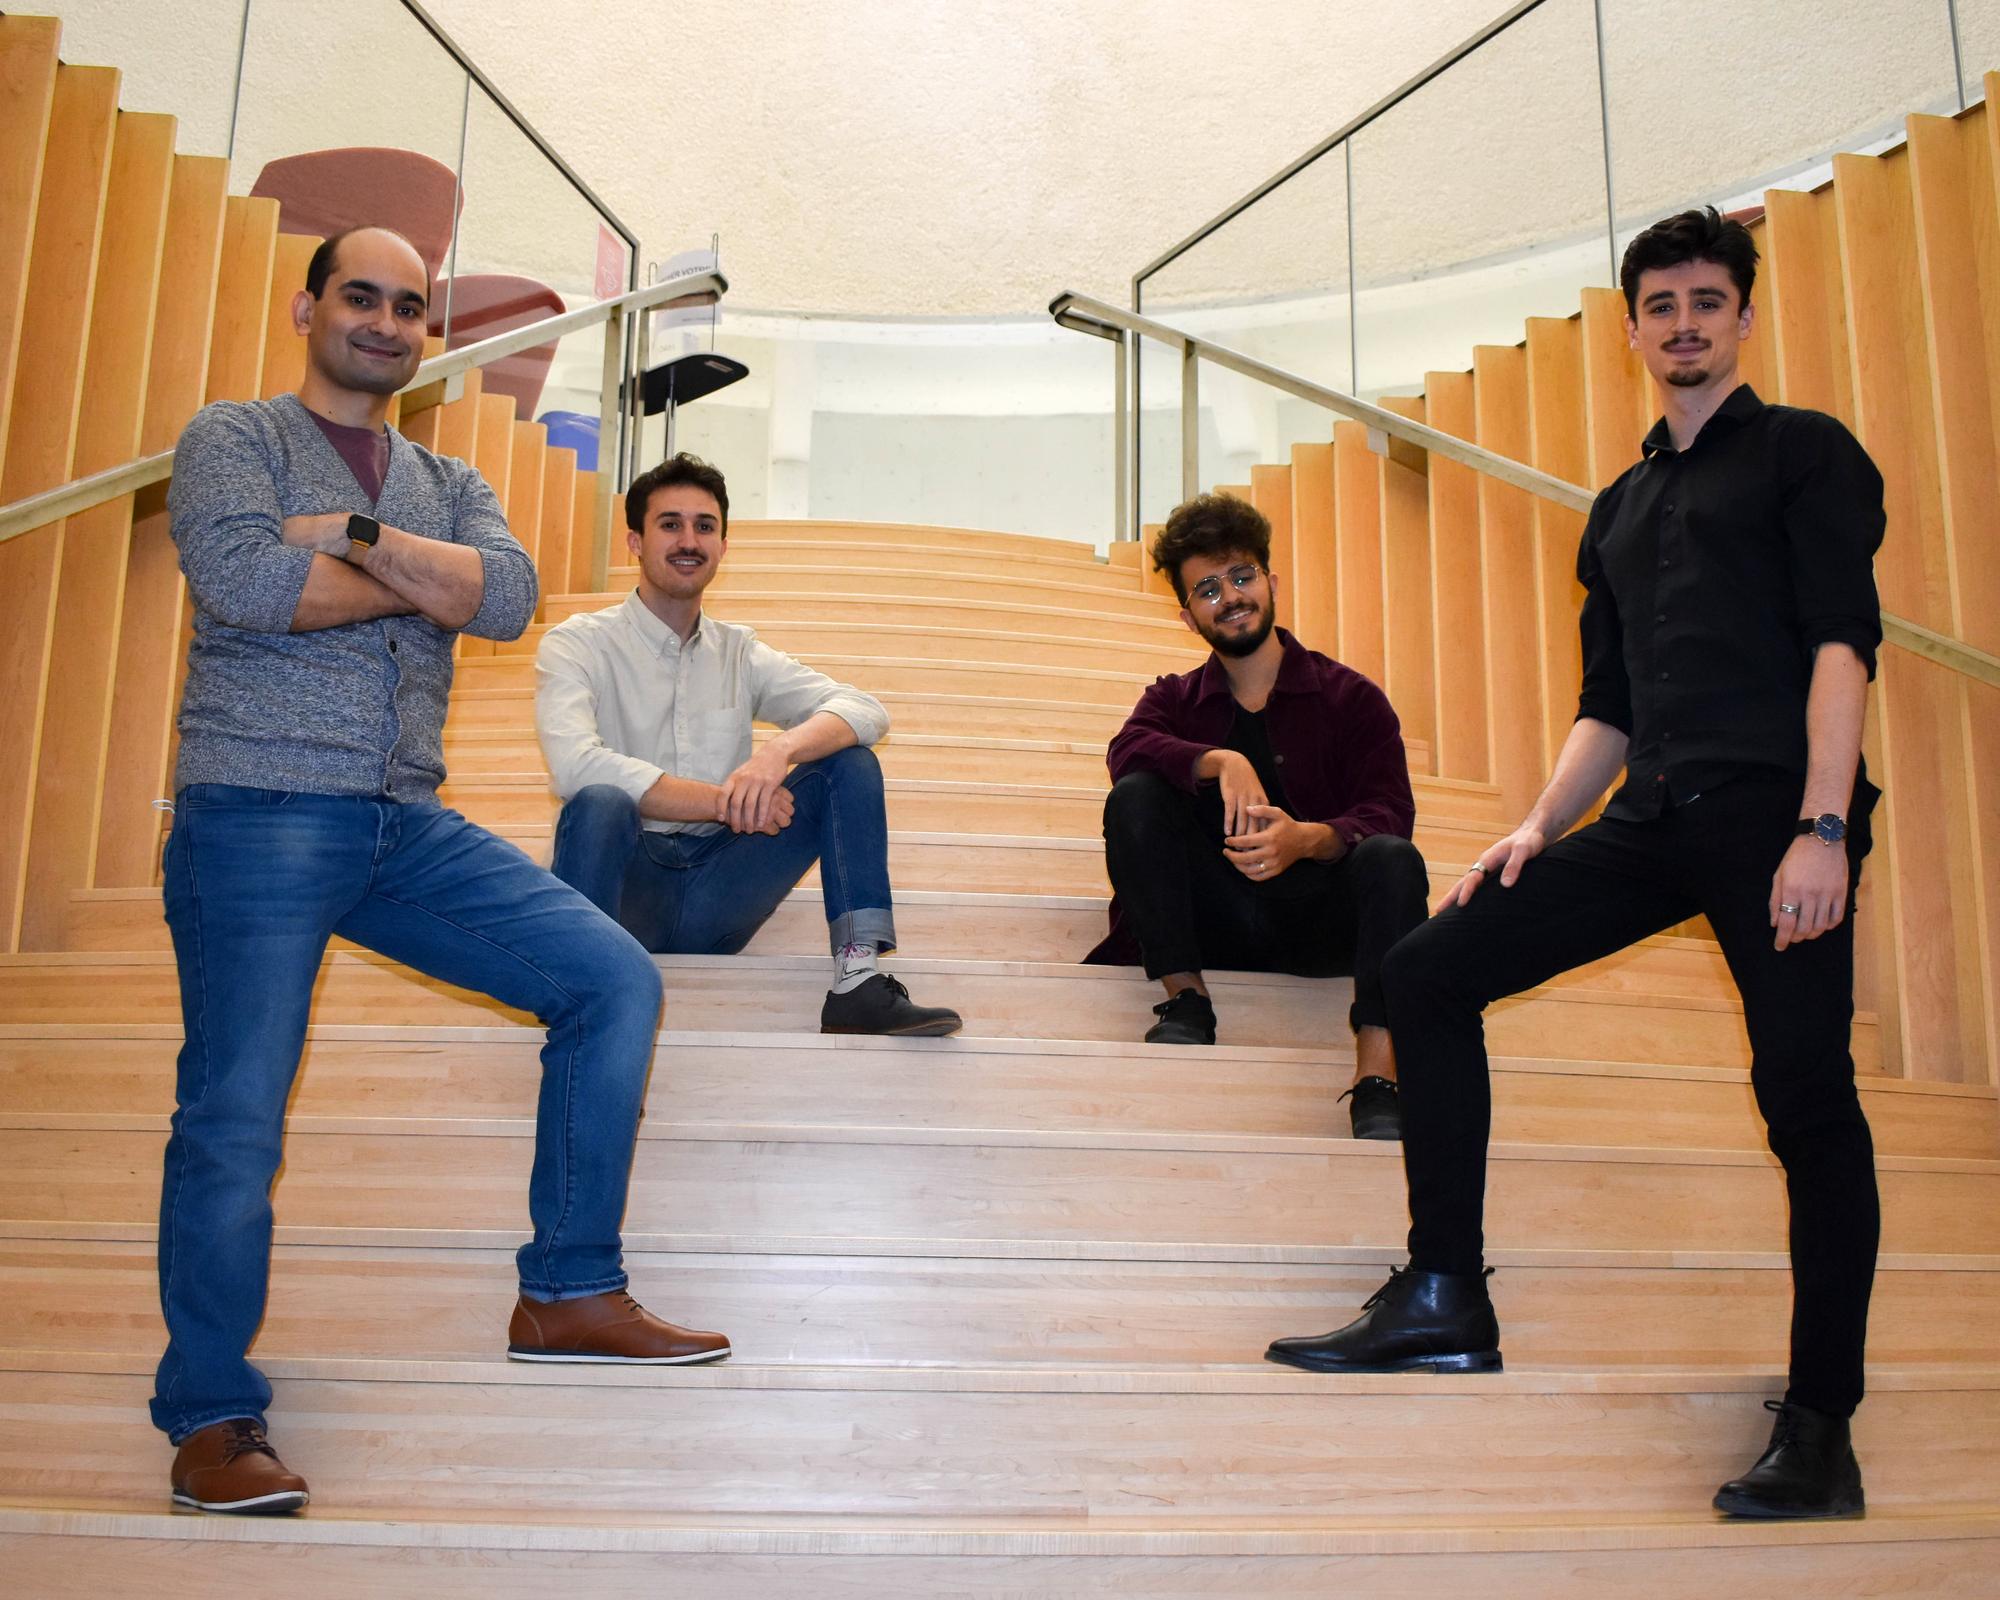 The executive team of the company GRAD4